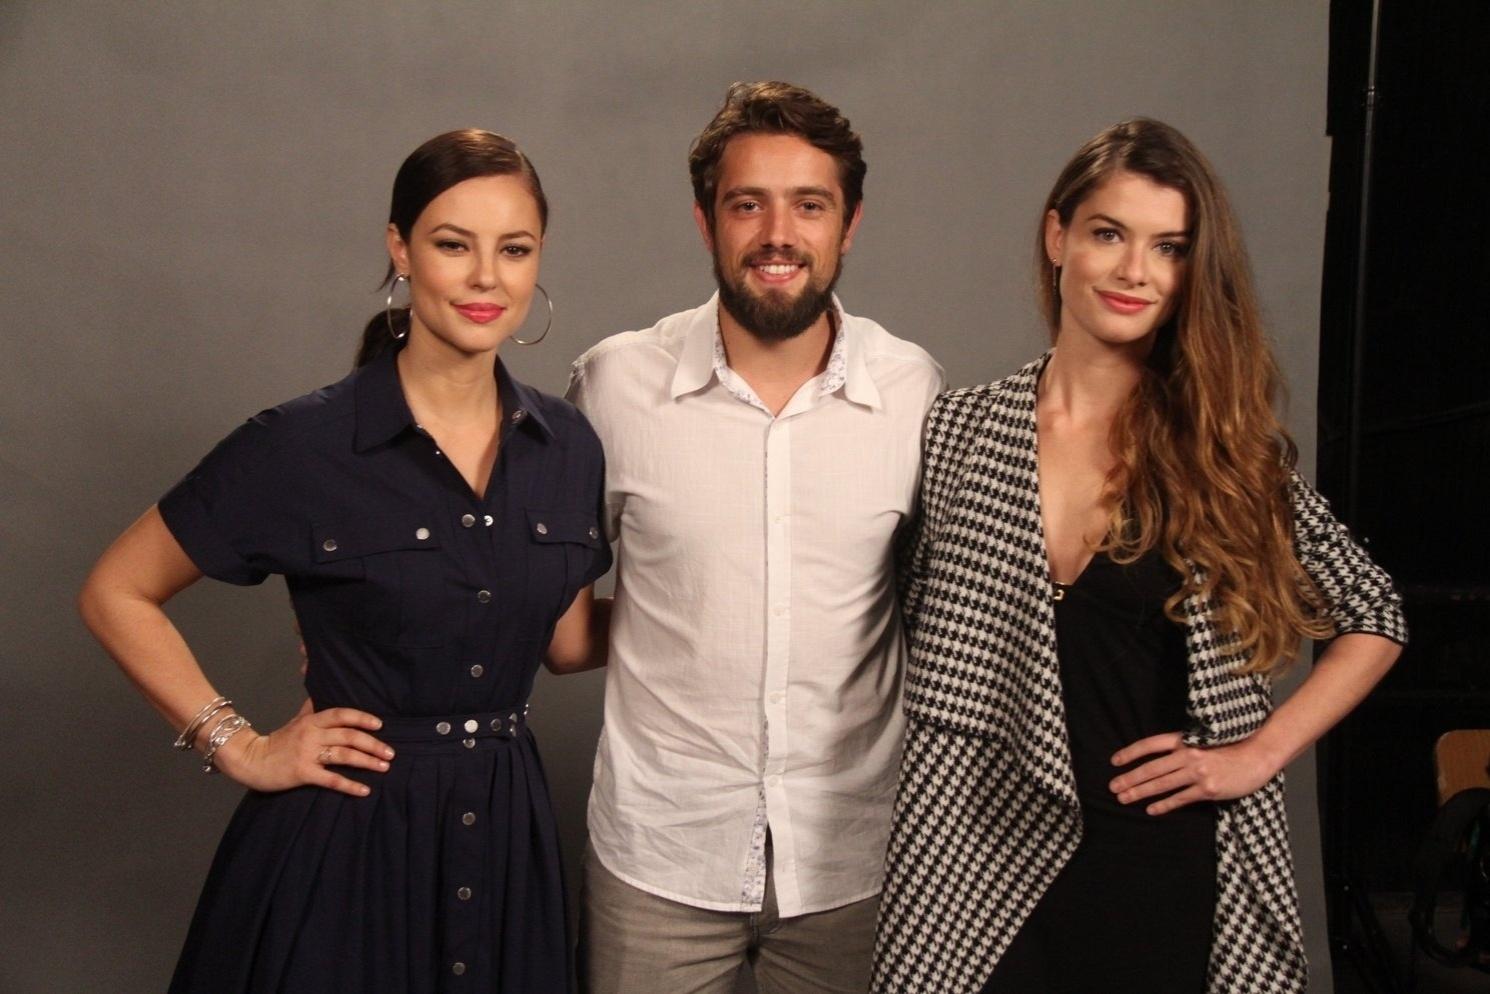 18.jun.2015 - Rafael Cardoso, Alinne Moraes e Paolla Oliveira posam para foto na coletiva de imprensa de